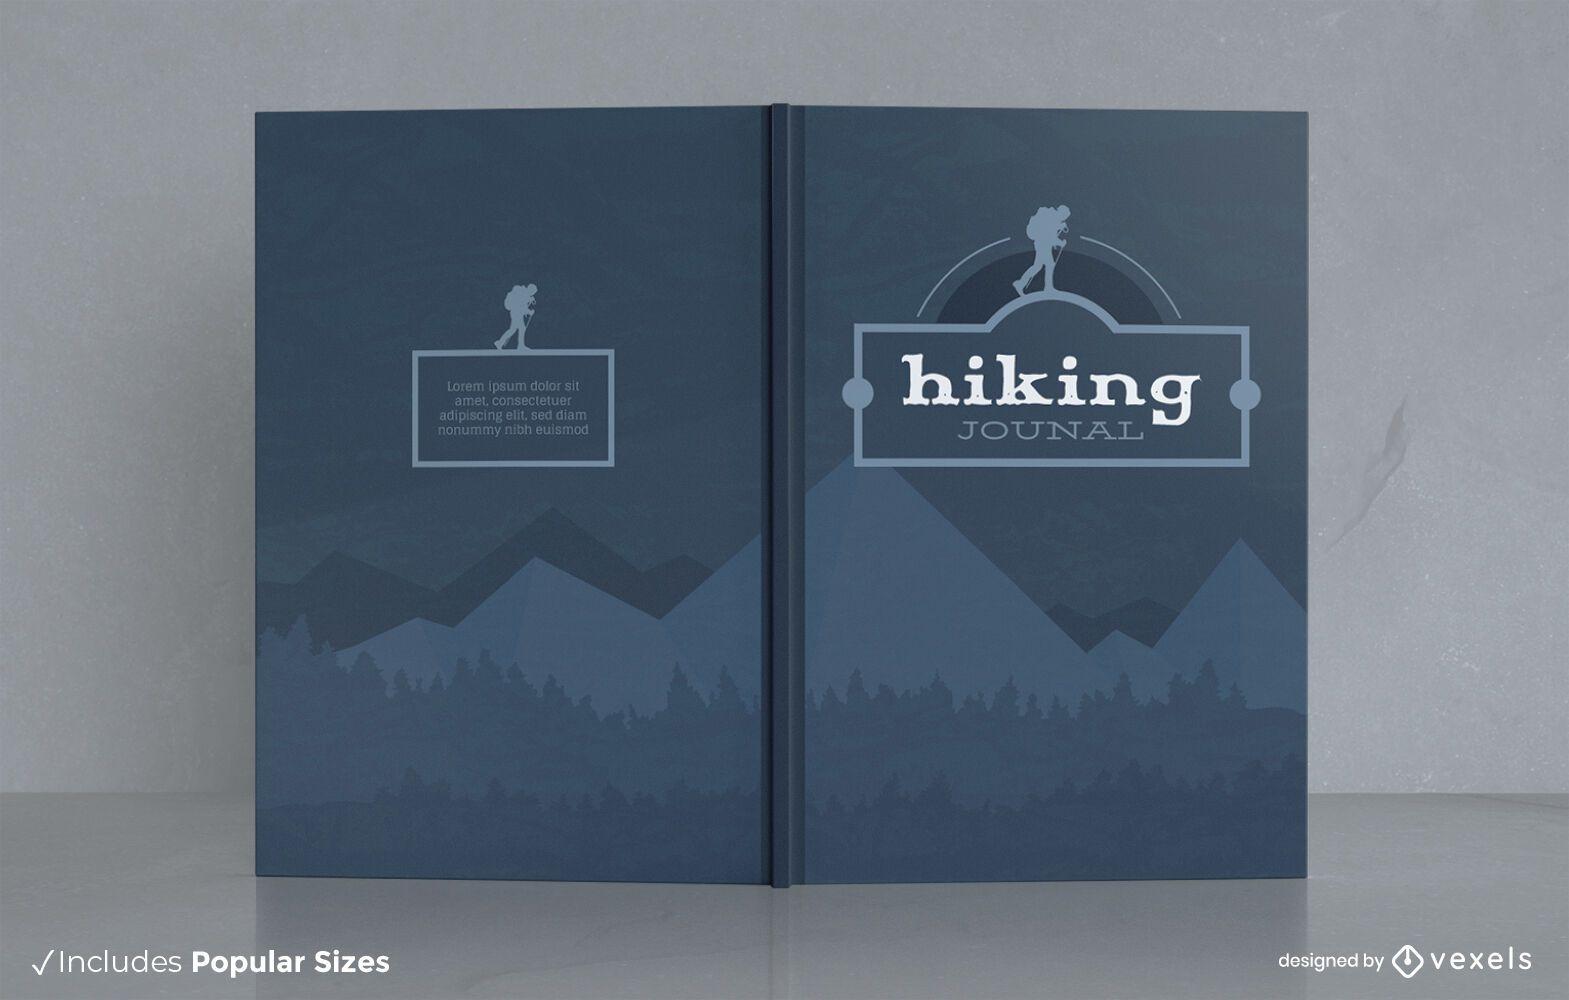 Senderismo hobby journal diseño de portada de la naturaleza